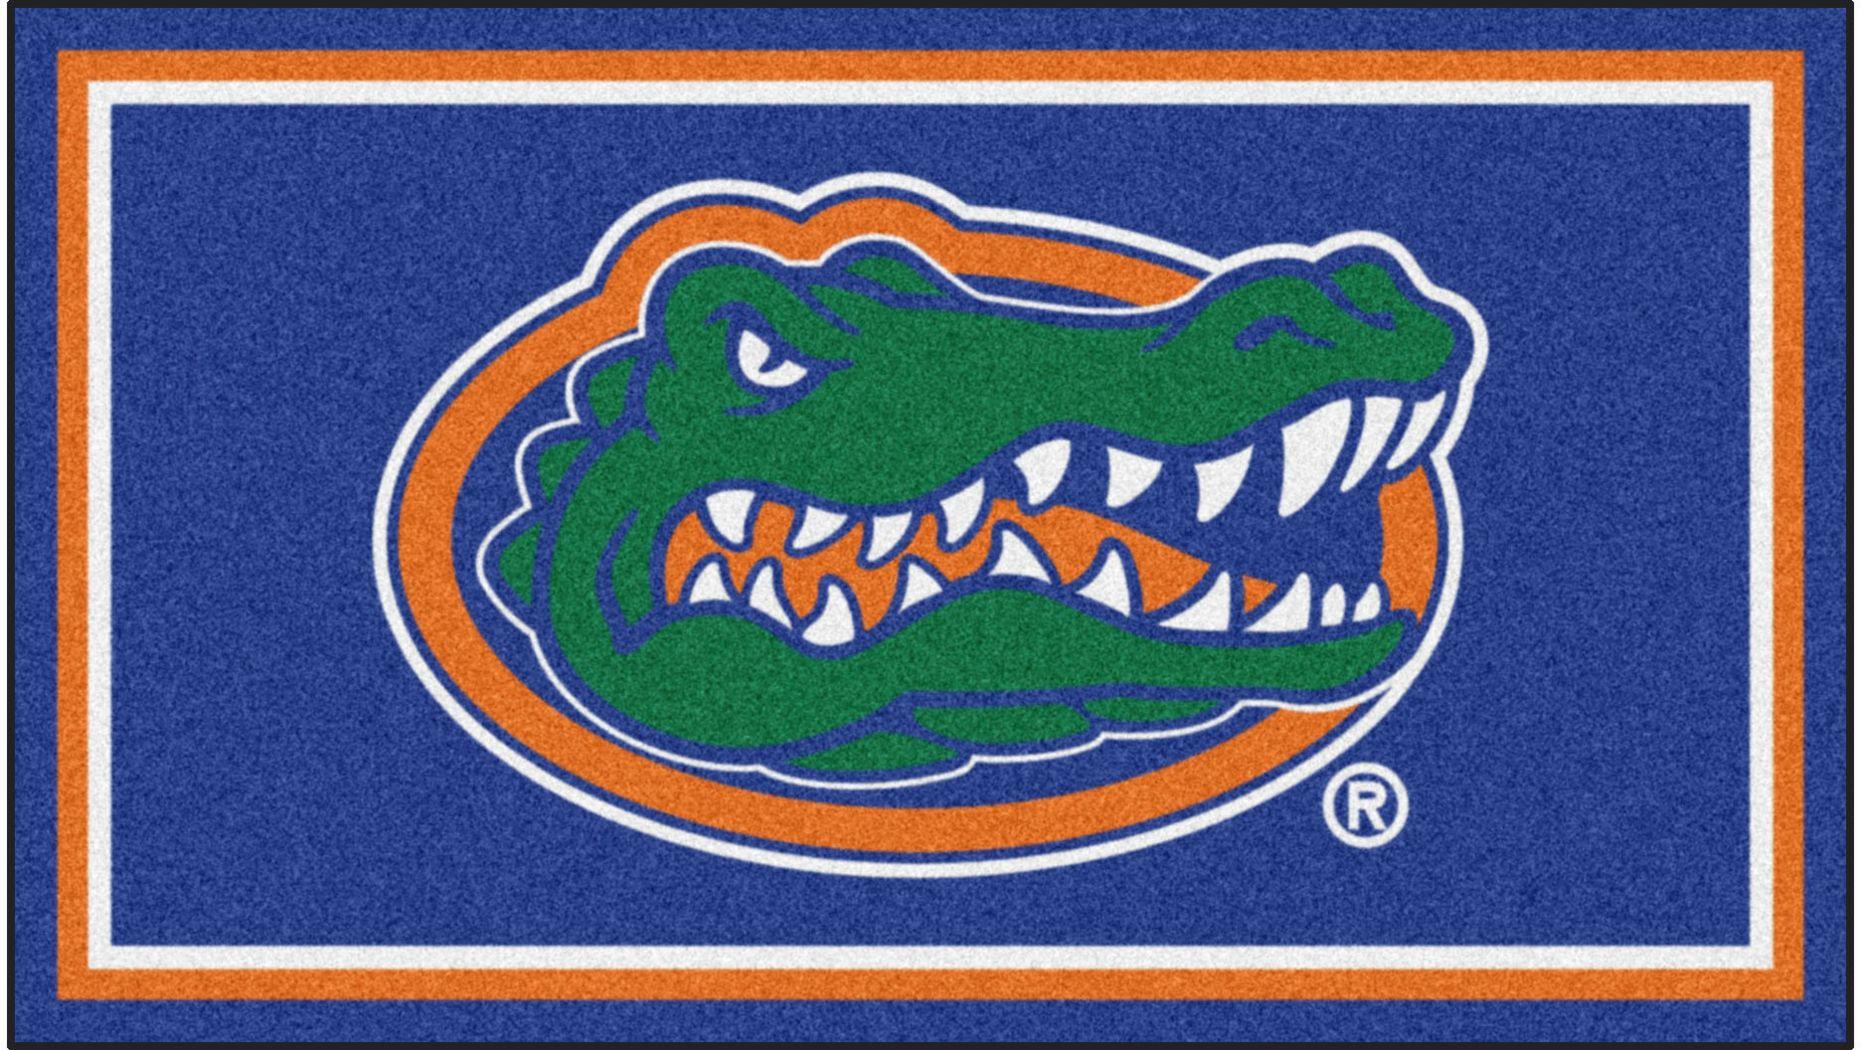 NCAA Big Game University of Florida 3' x 5' Rug